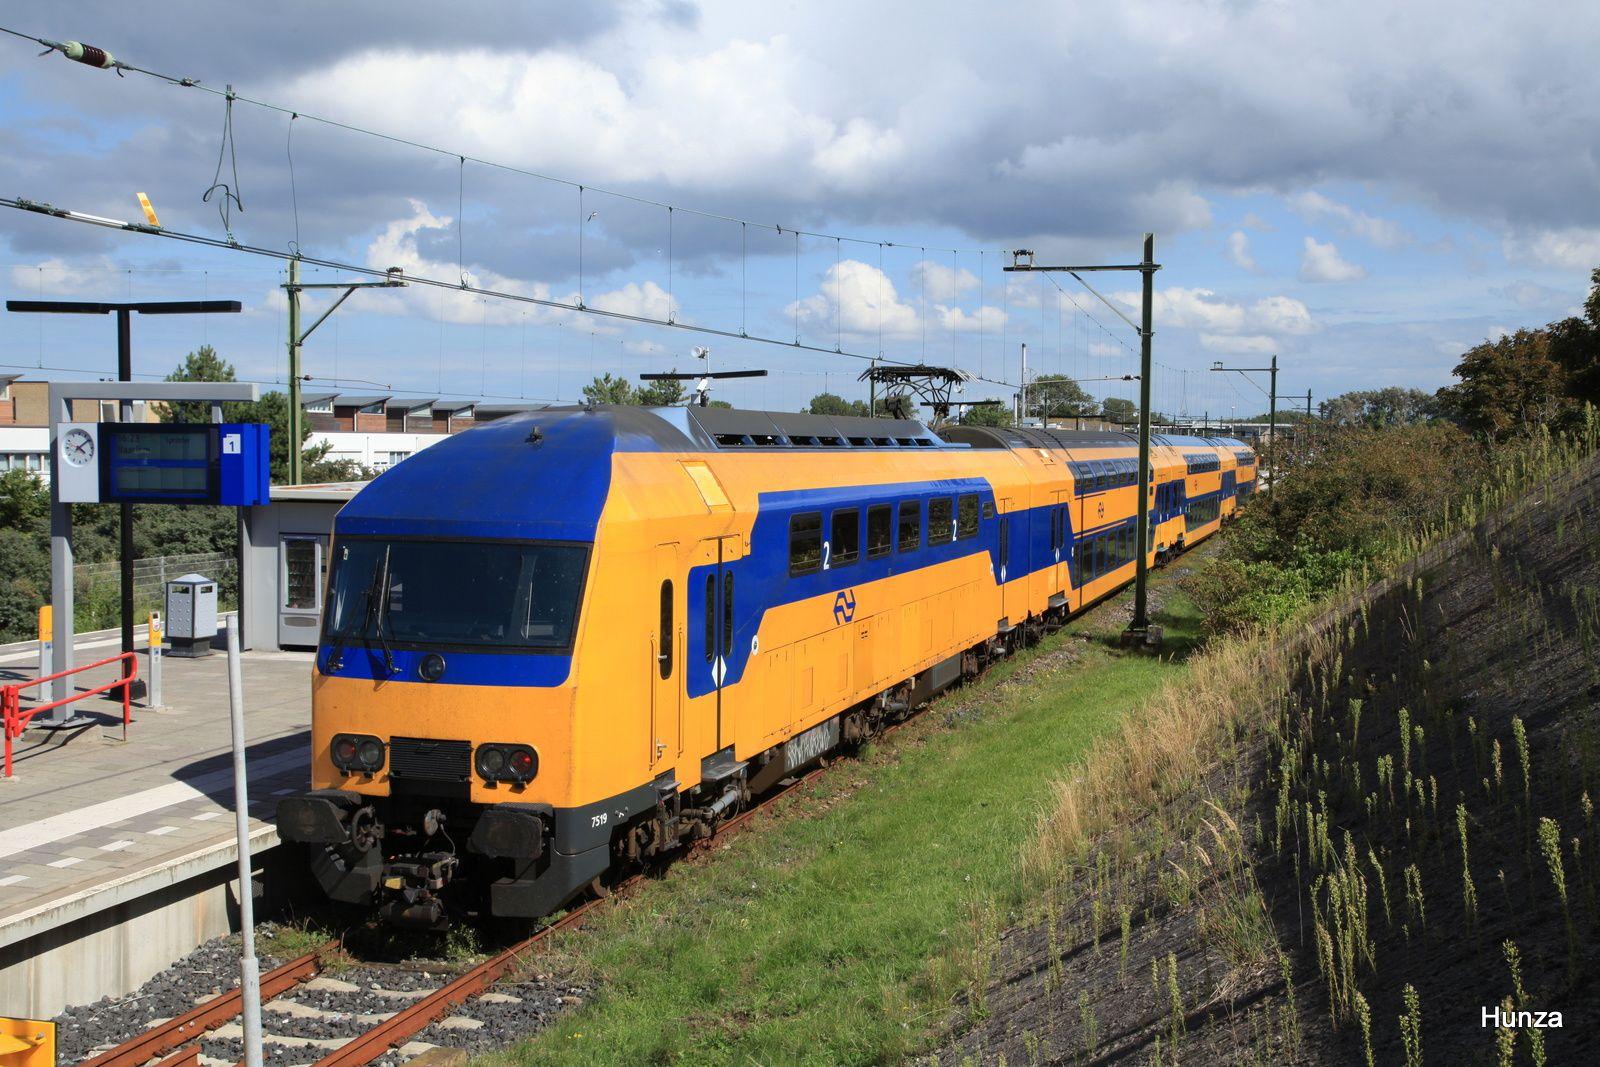 Rame n°7519 assurant la liaison Zandvoort - Haarlem (13 août 2017)